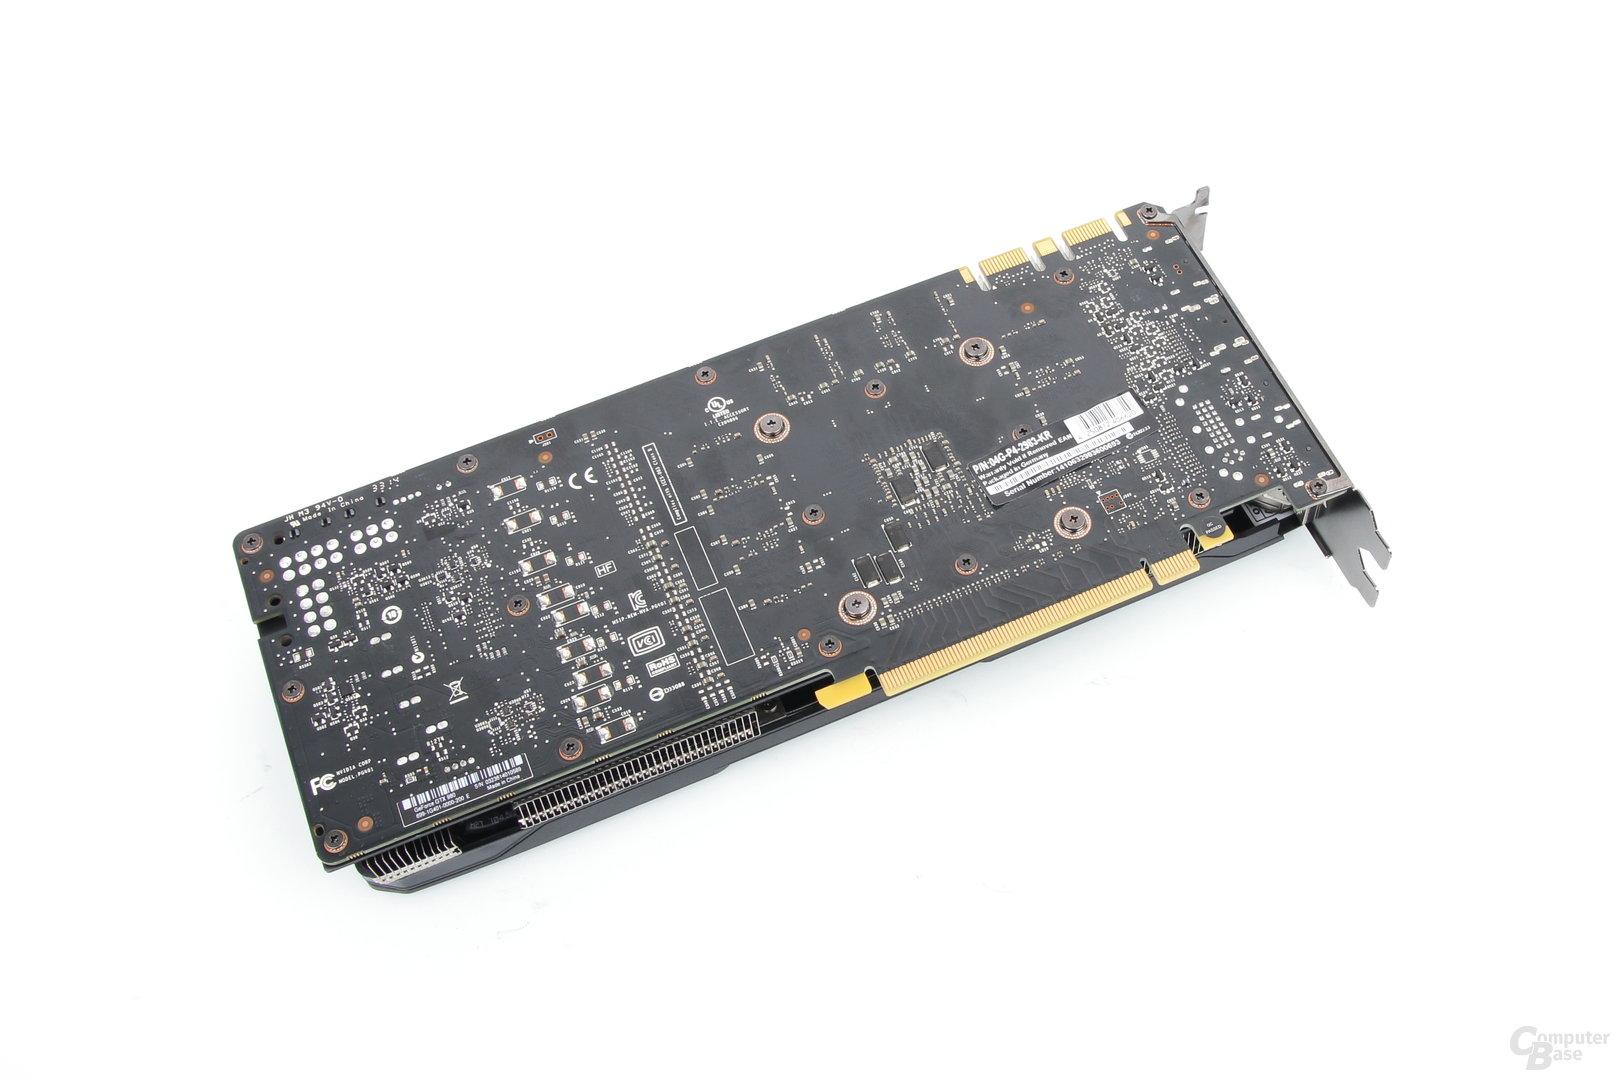 EVGA GeForce GTX 980 SC ACX 2.0 – Rückseite